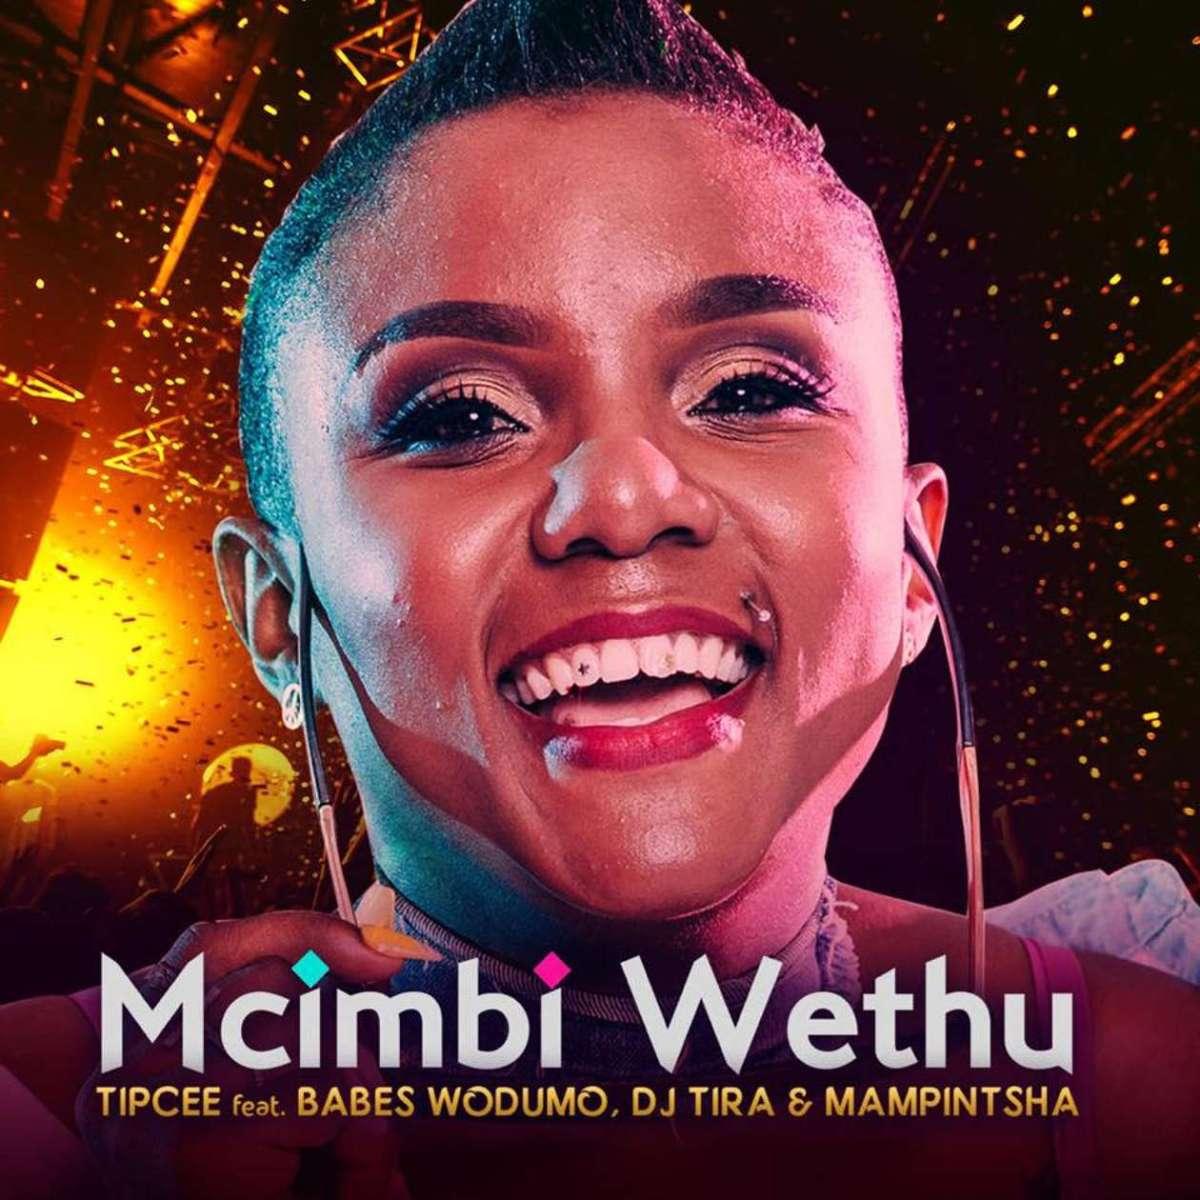 Tipcee - Mcimbi Wethu (feat. Babes Wodumo, DJ Tira & Mampintsha)